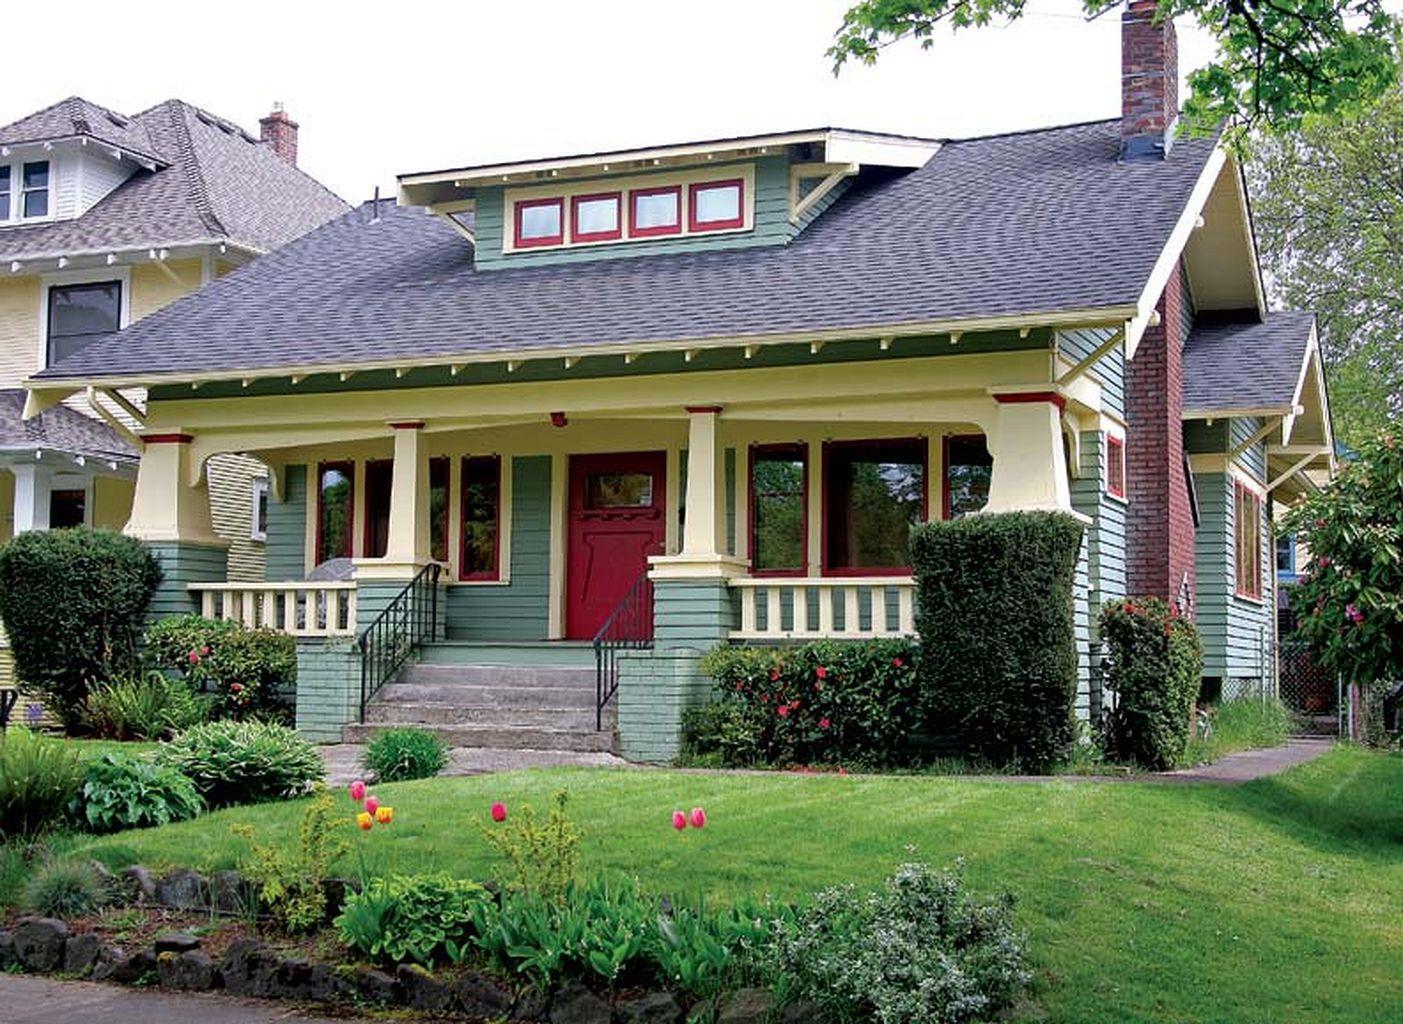 Craftsman Style Homes Exterior Ideas #craftsmanstylehomes